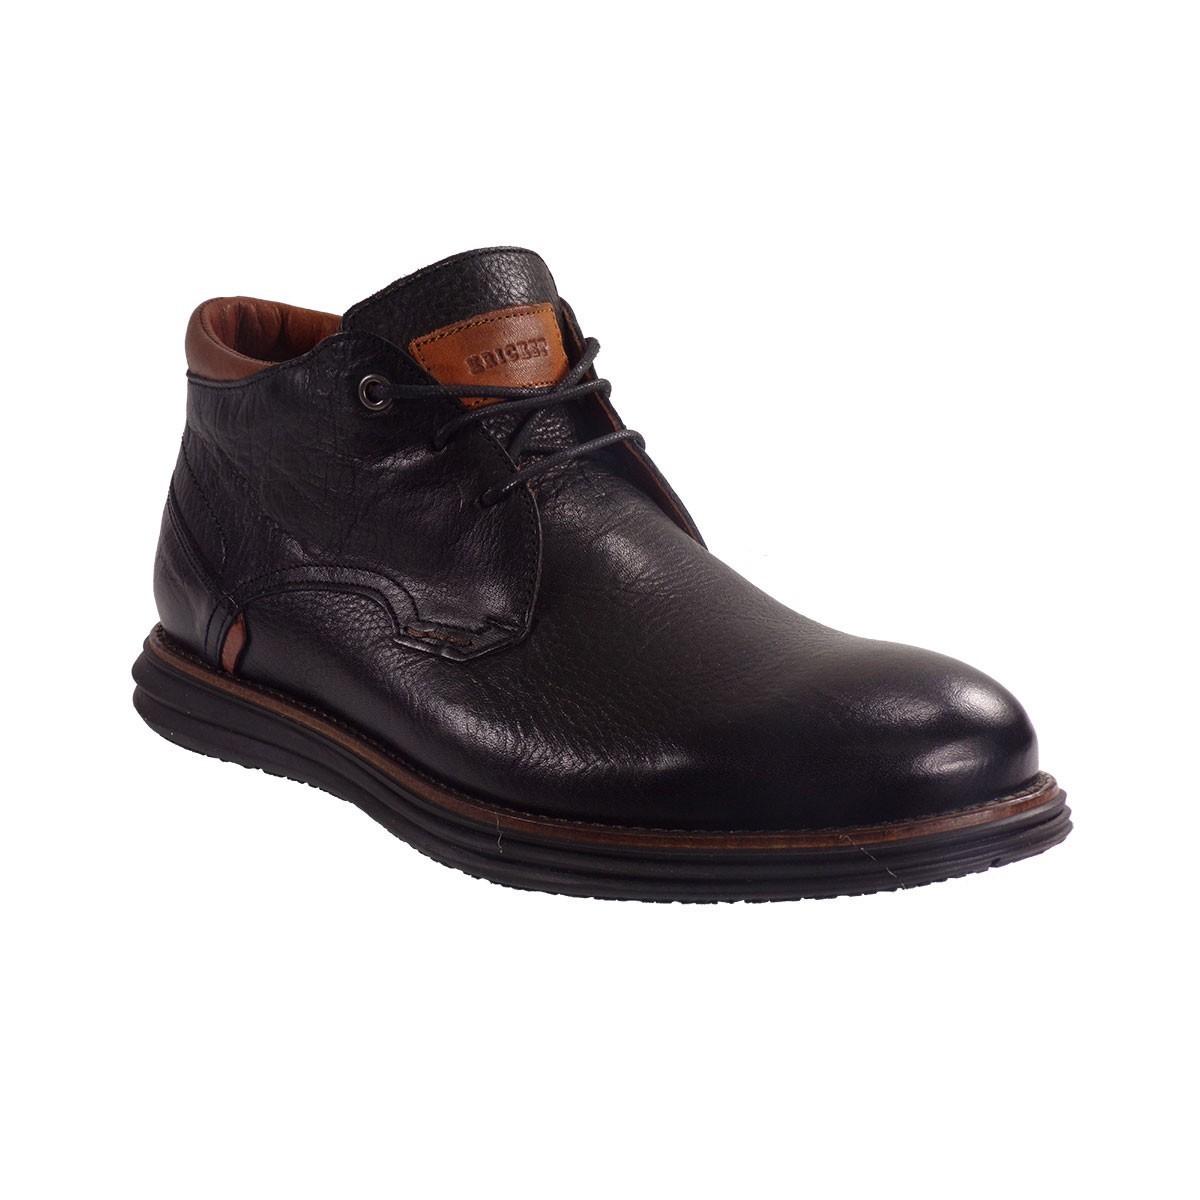 Kricket Shoes Ανδρικά Μποτάκια 1011 Μαύρο Δέρμα